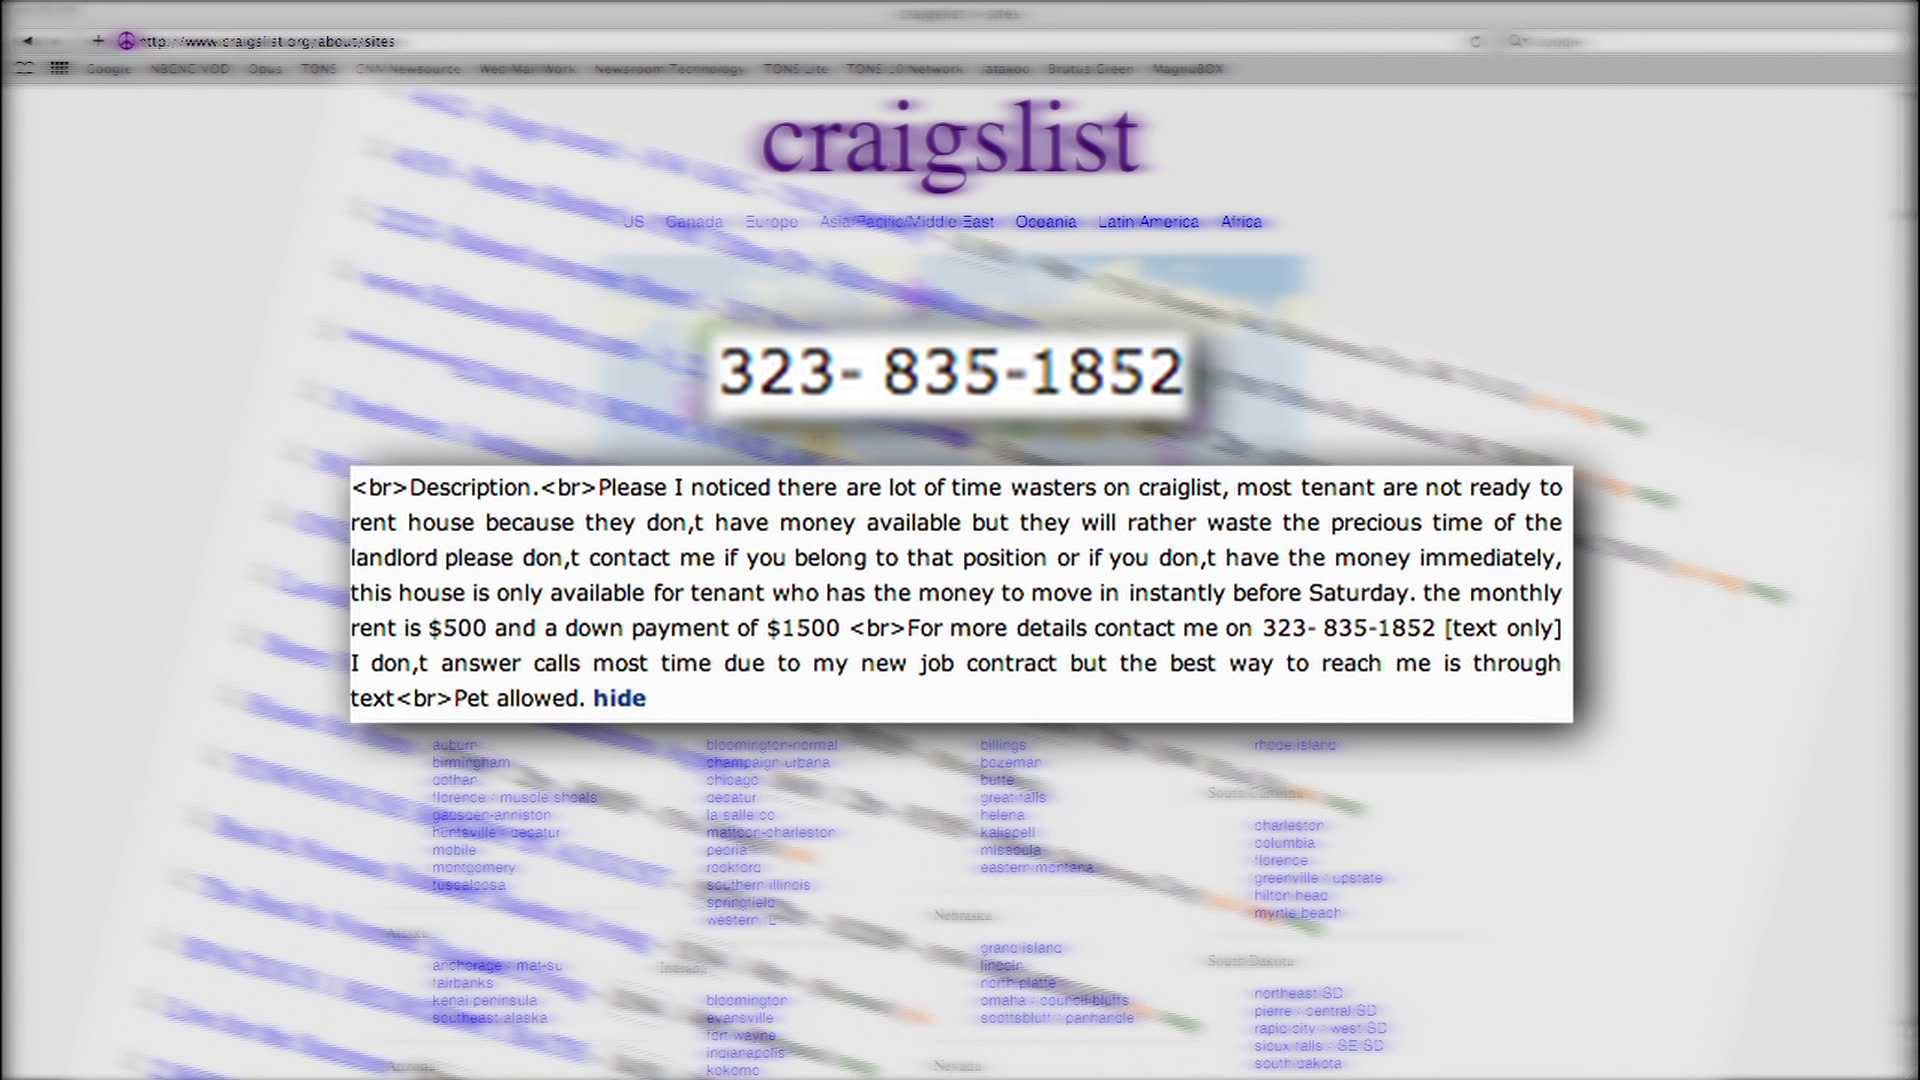 Iyc Craigslist Rental Scam Kfor Com Oklahoma City Community events for sale gigs housing jobs resumes services. kfor oklahoma city